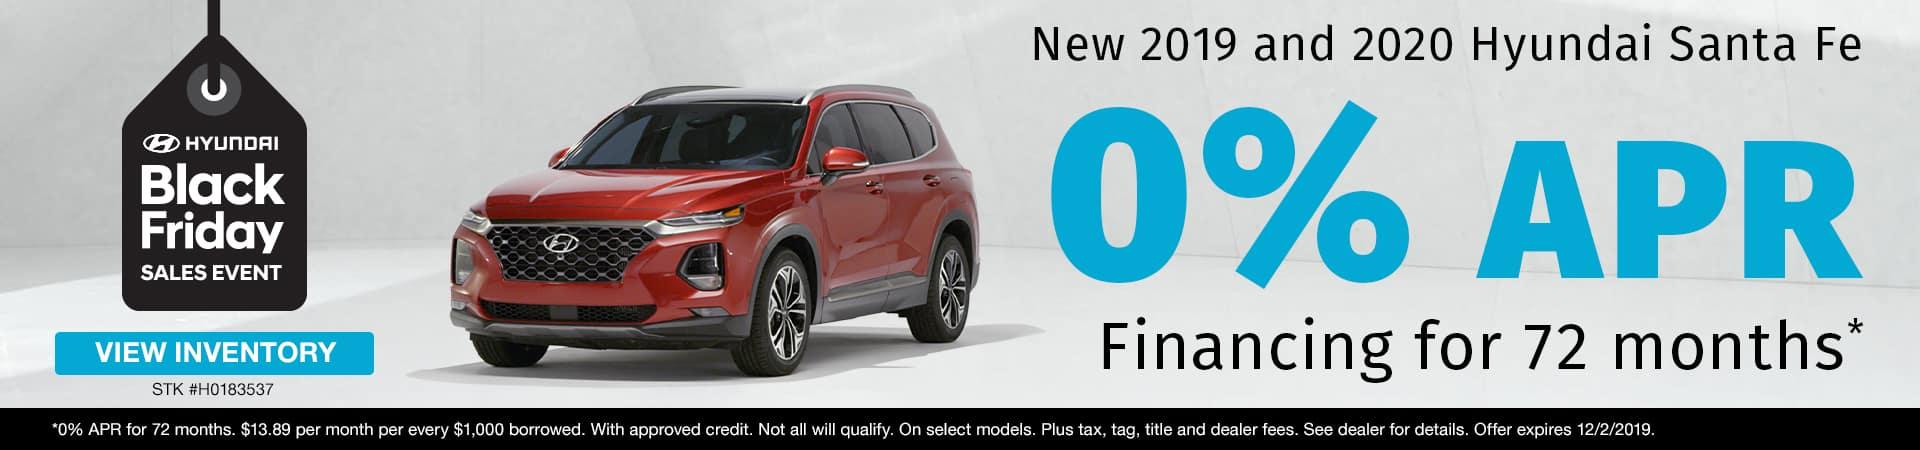 Get 0% APR Financing on new 2019 or 2020 Hyundai Santa Fe models in Murfreesboro TN